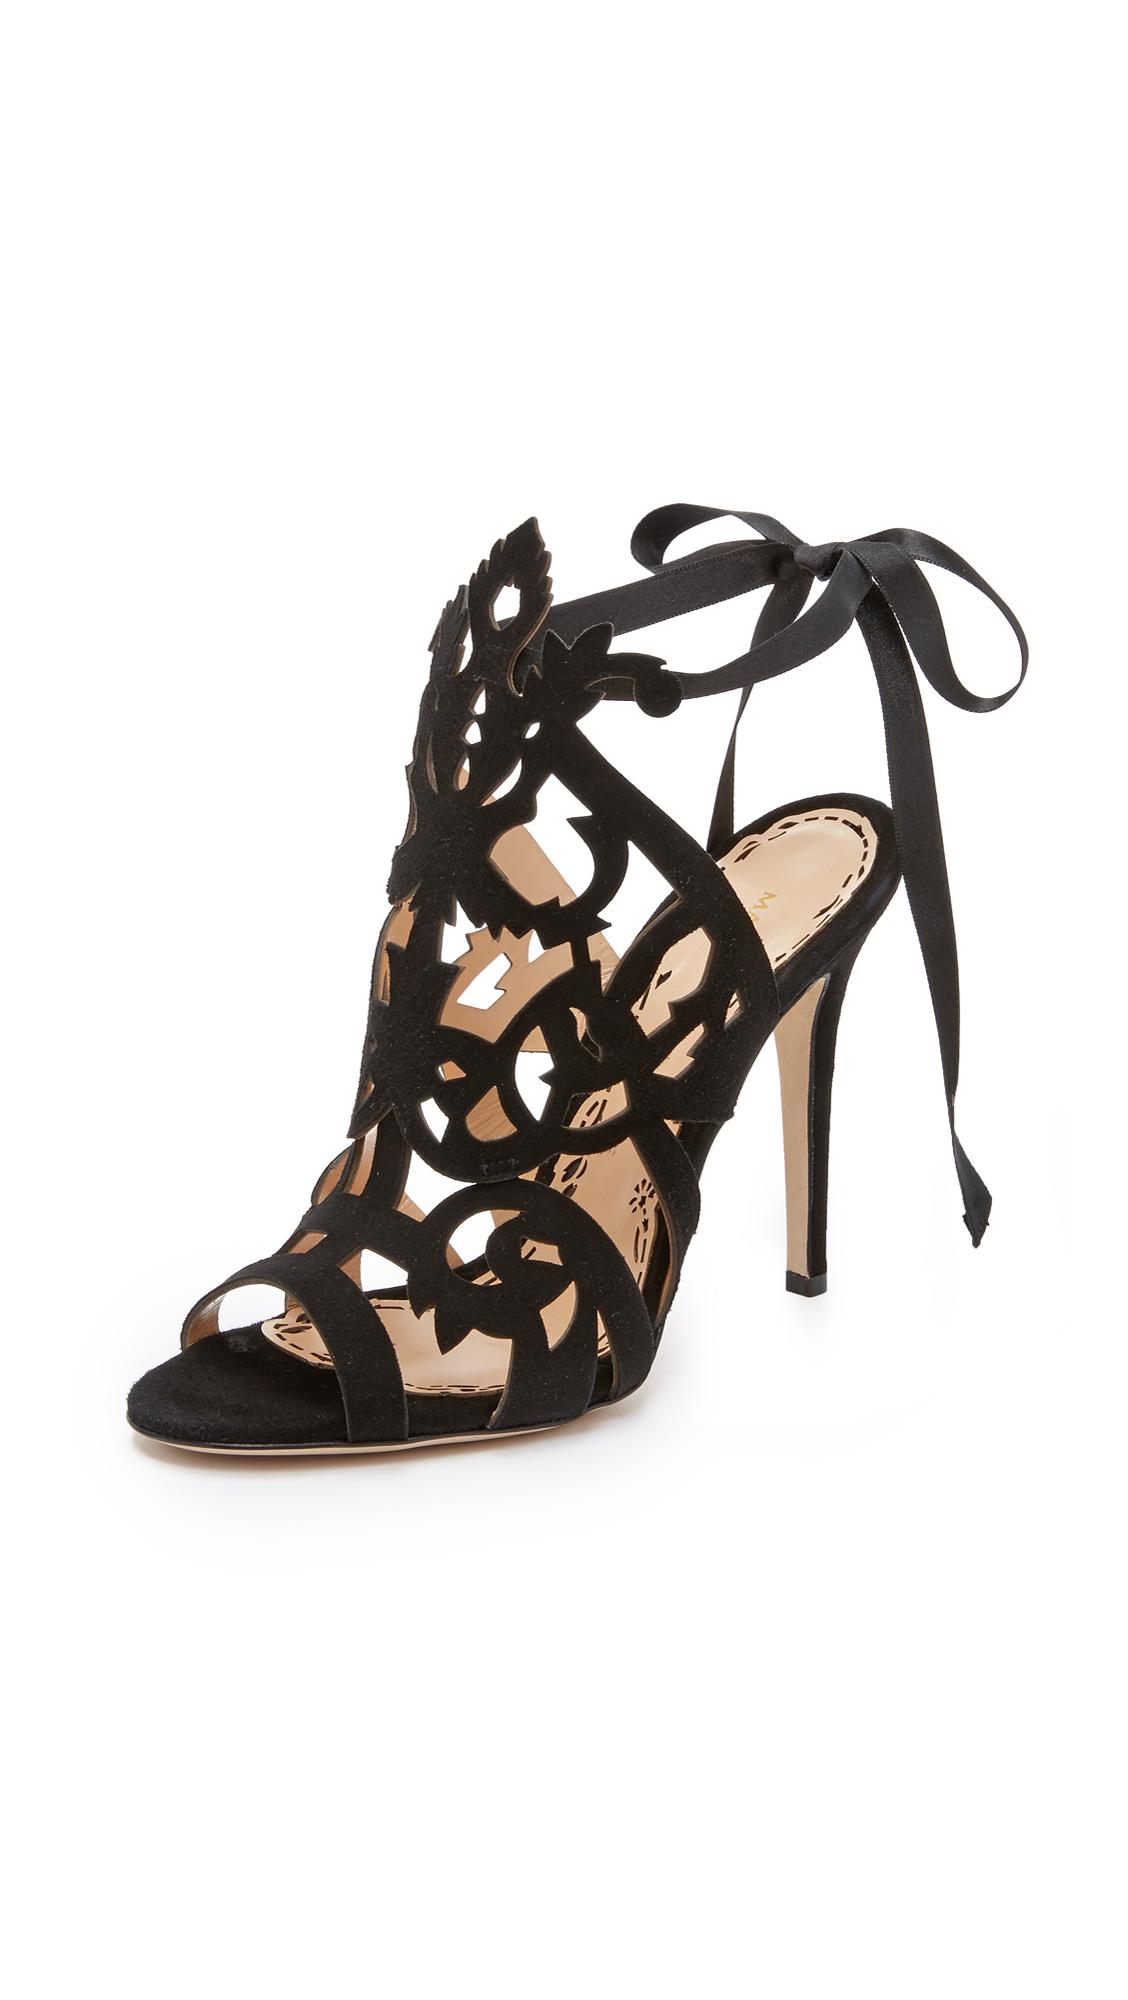 0a0b05ae6f051 Marchesa Jessica Cutout Sandals